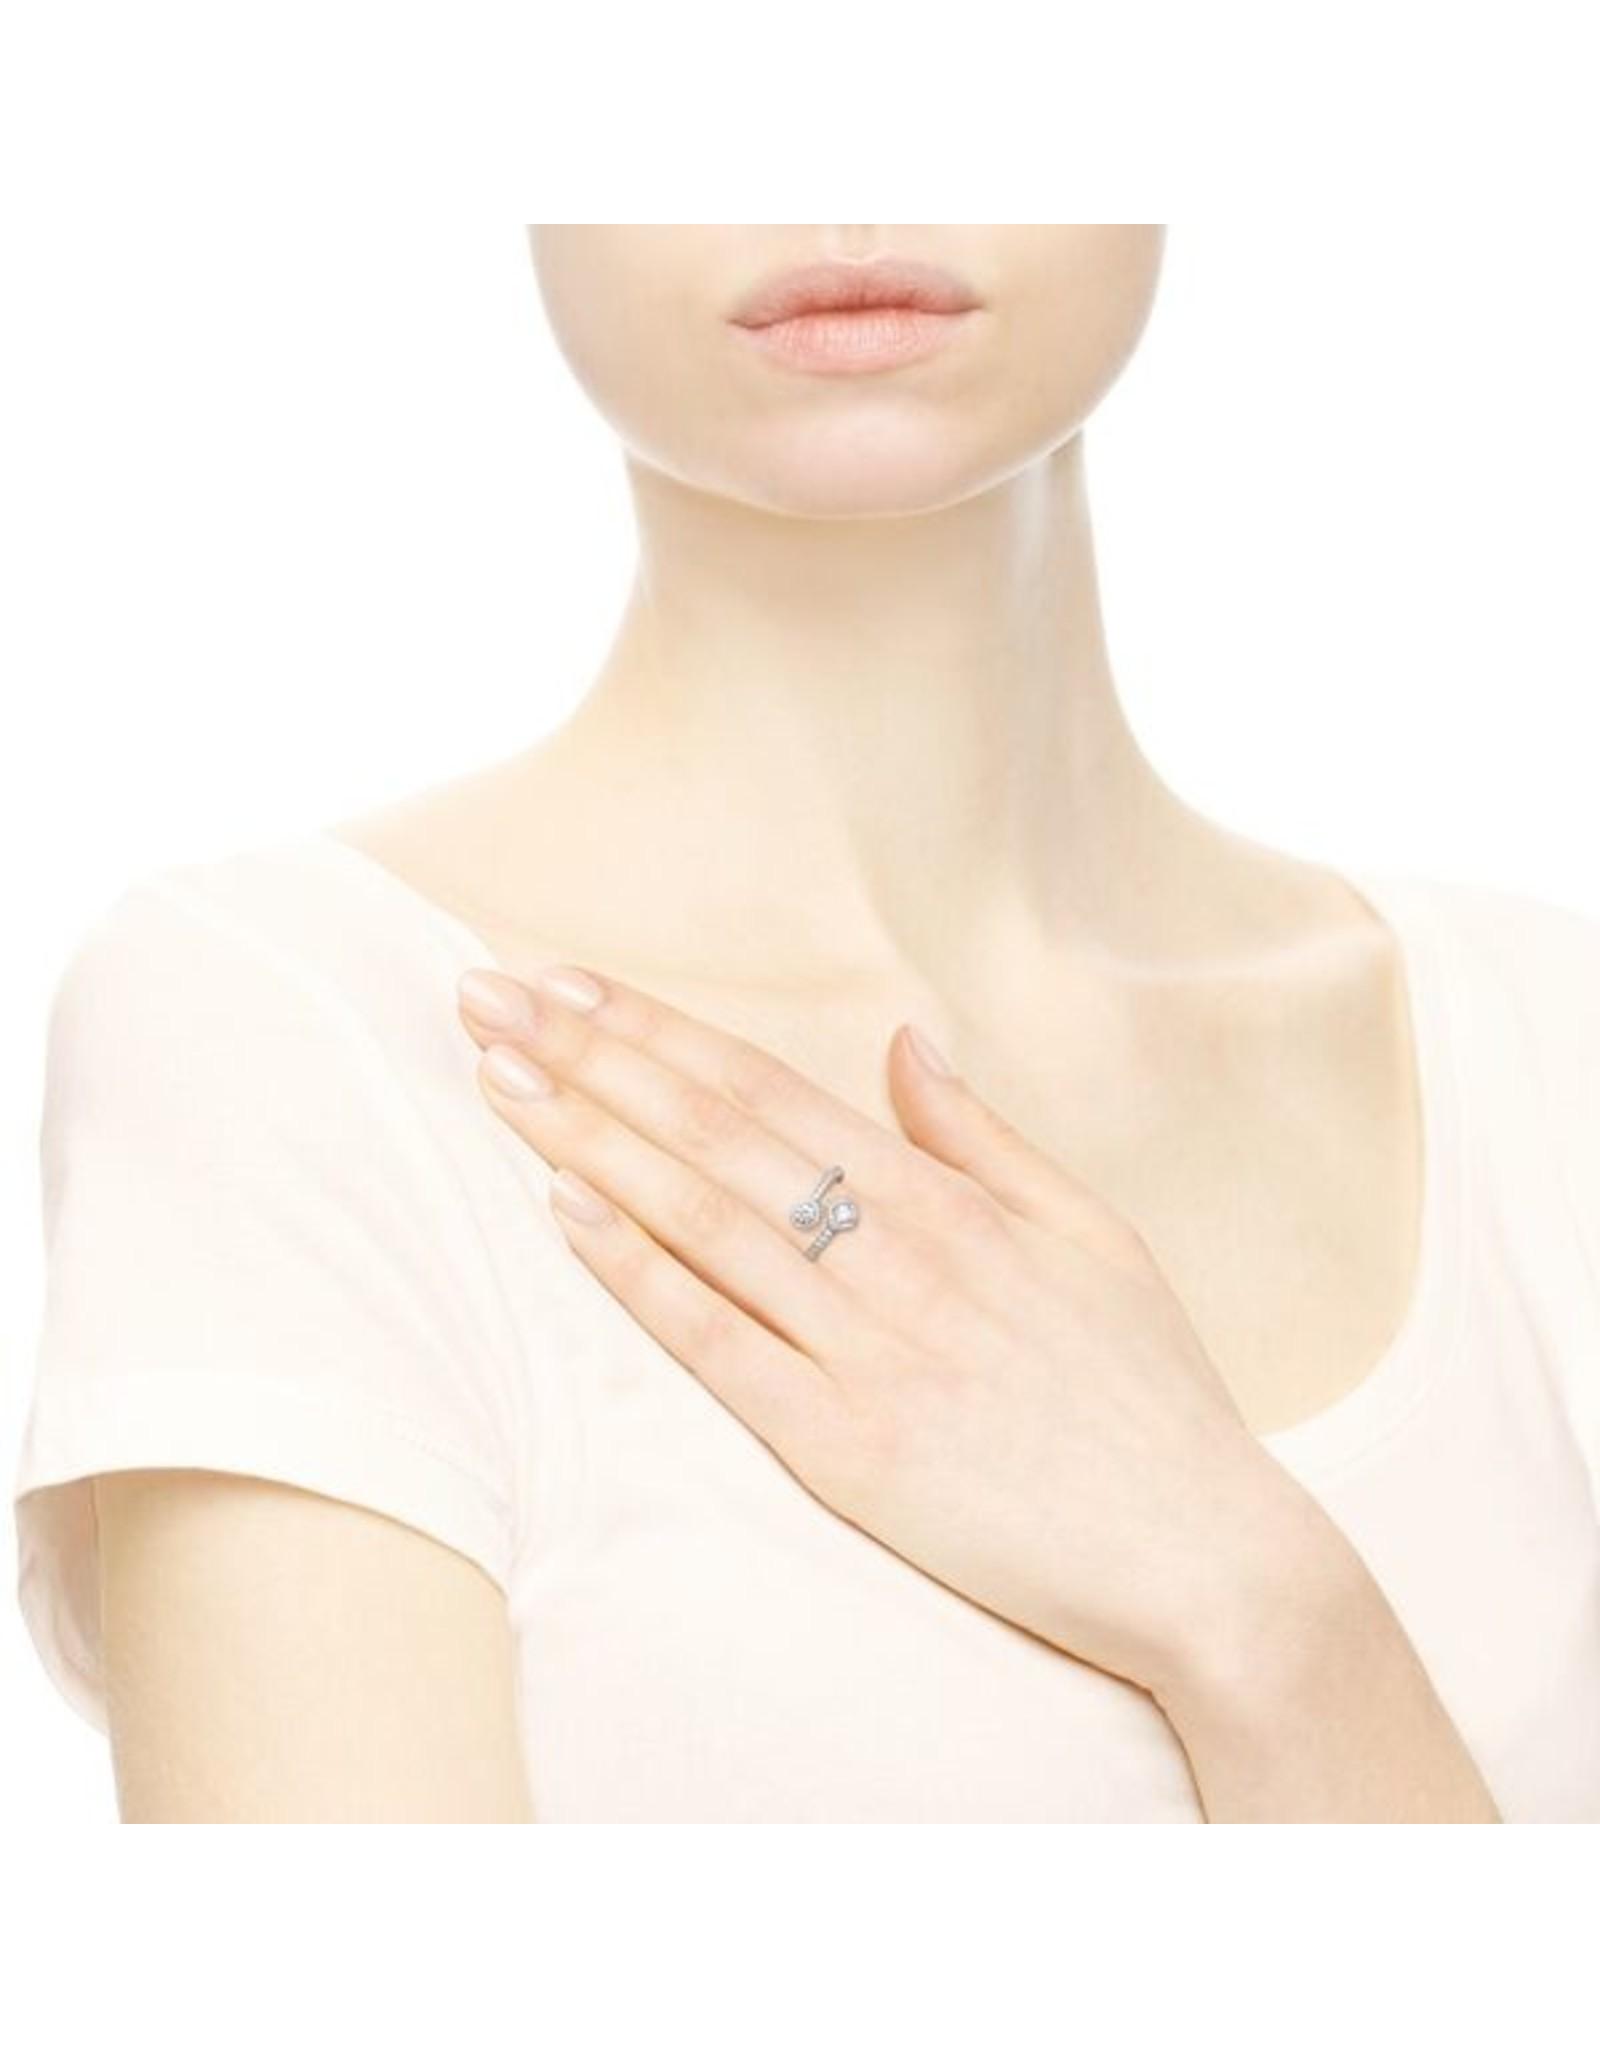 Pandora Pandora Ring, Abstract Elegance, Clear CZ